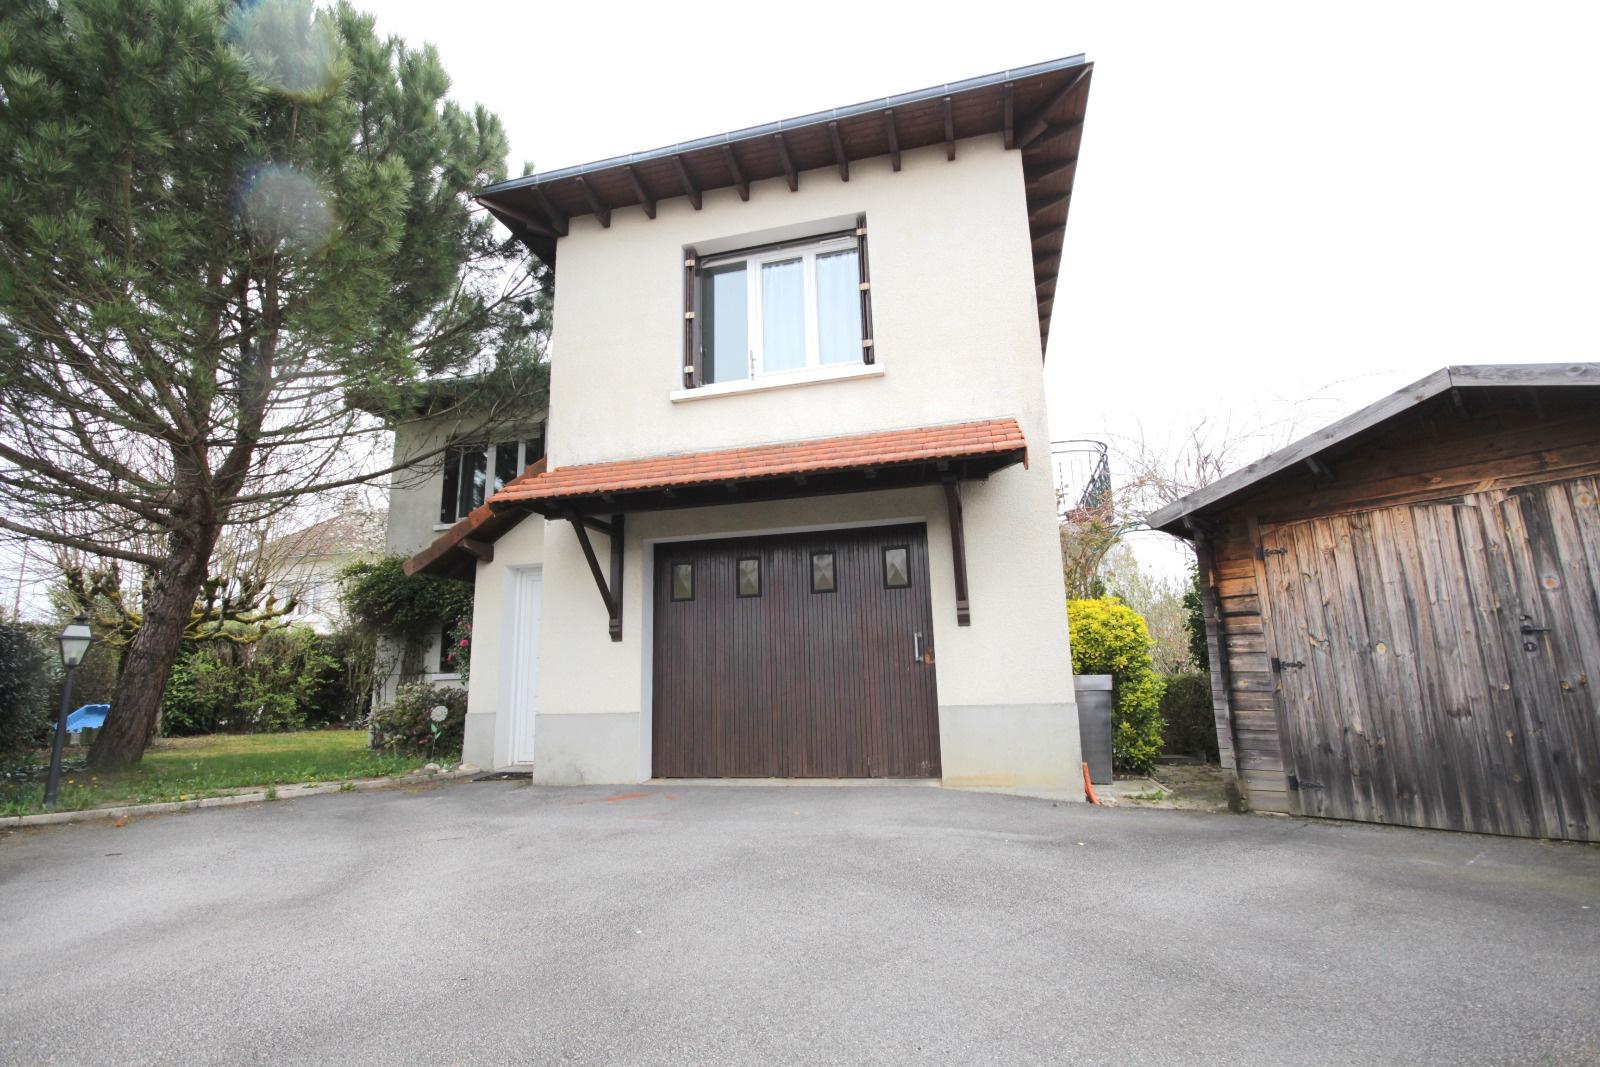 Garage Feytiat concernant vente feytiat: maison 5 pièces, 4 chambres, garage